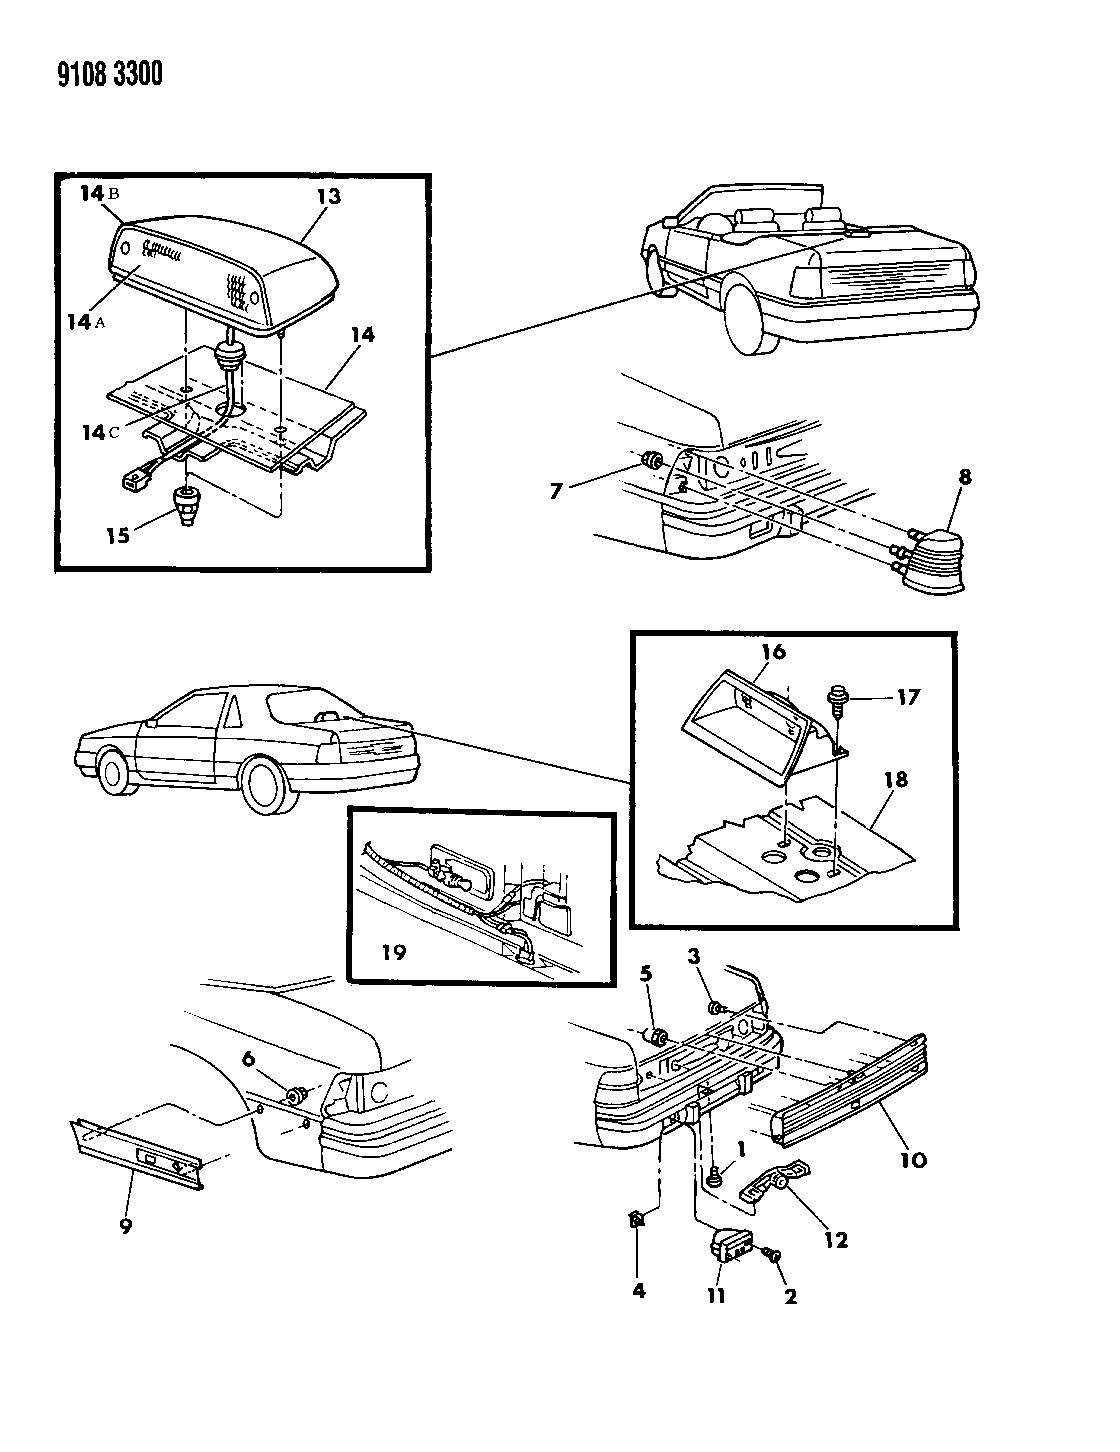 1989 Chrysler Lebaron Gtc Lamps Wiring Rear Diagram